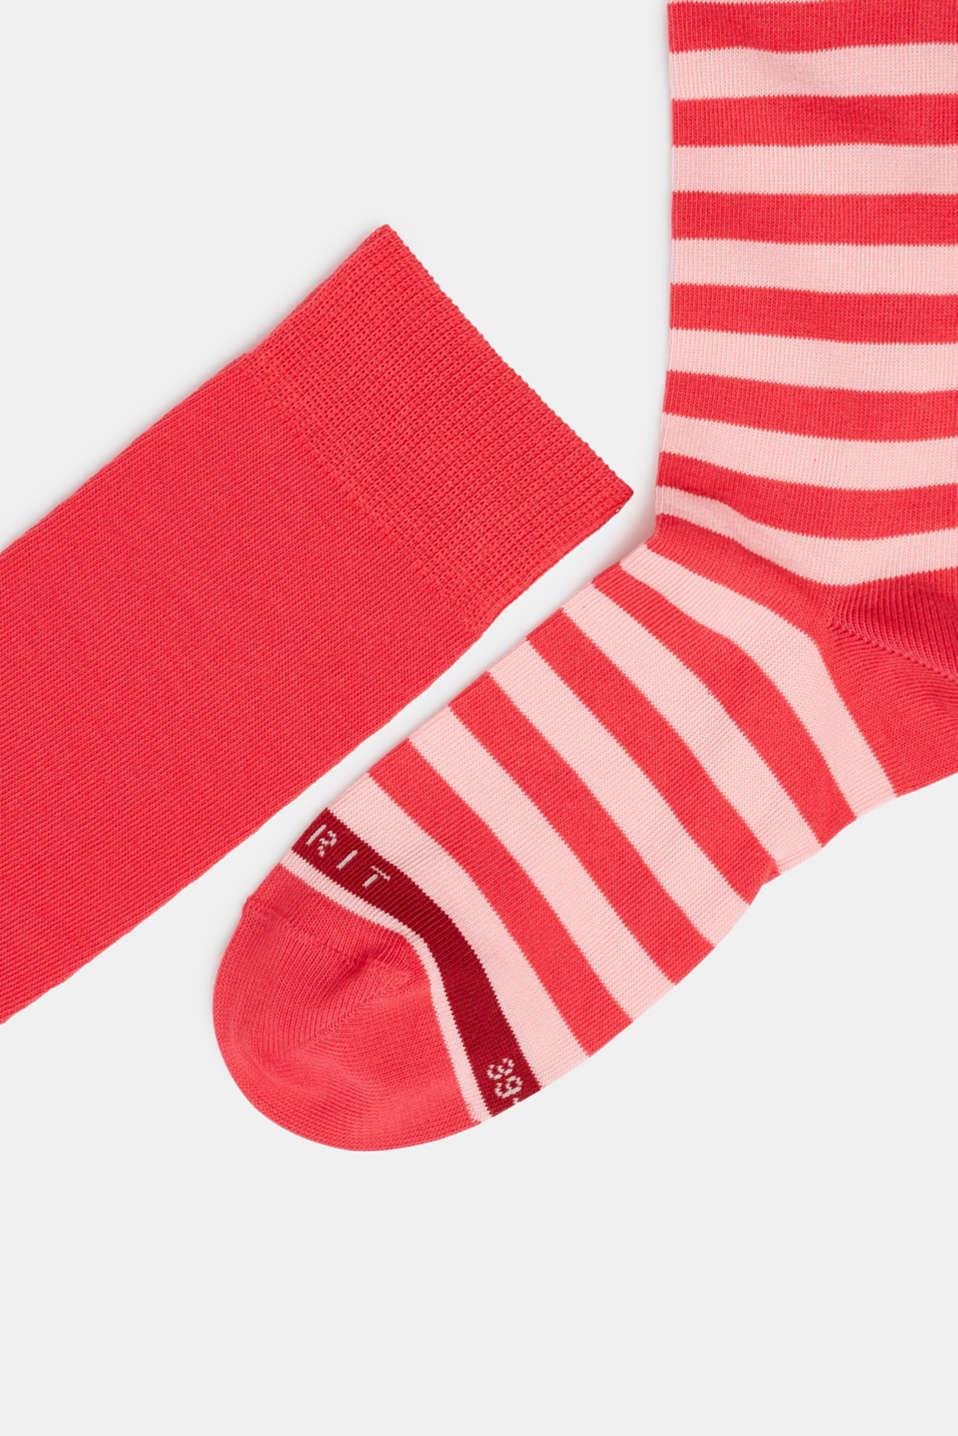 2-pack of striped knee-high socks, PINK, detail image number 1